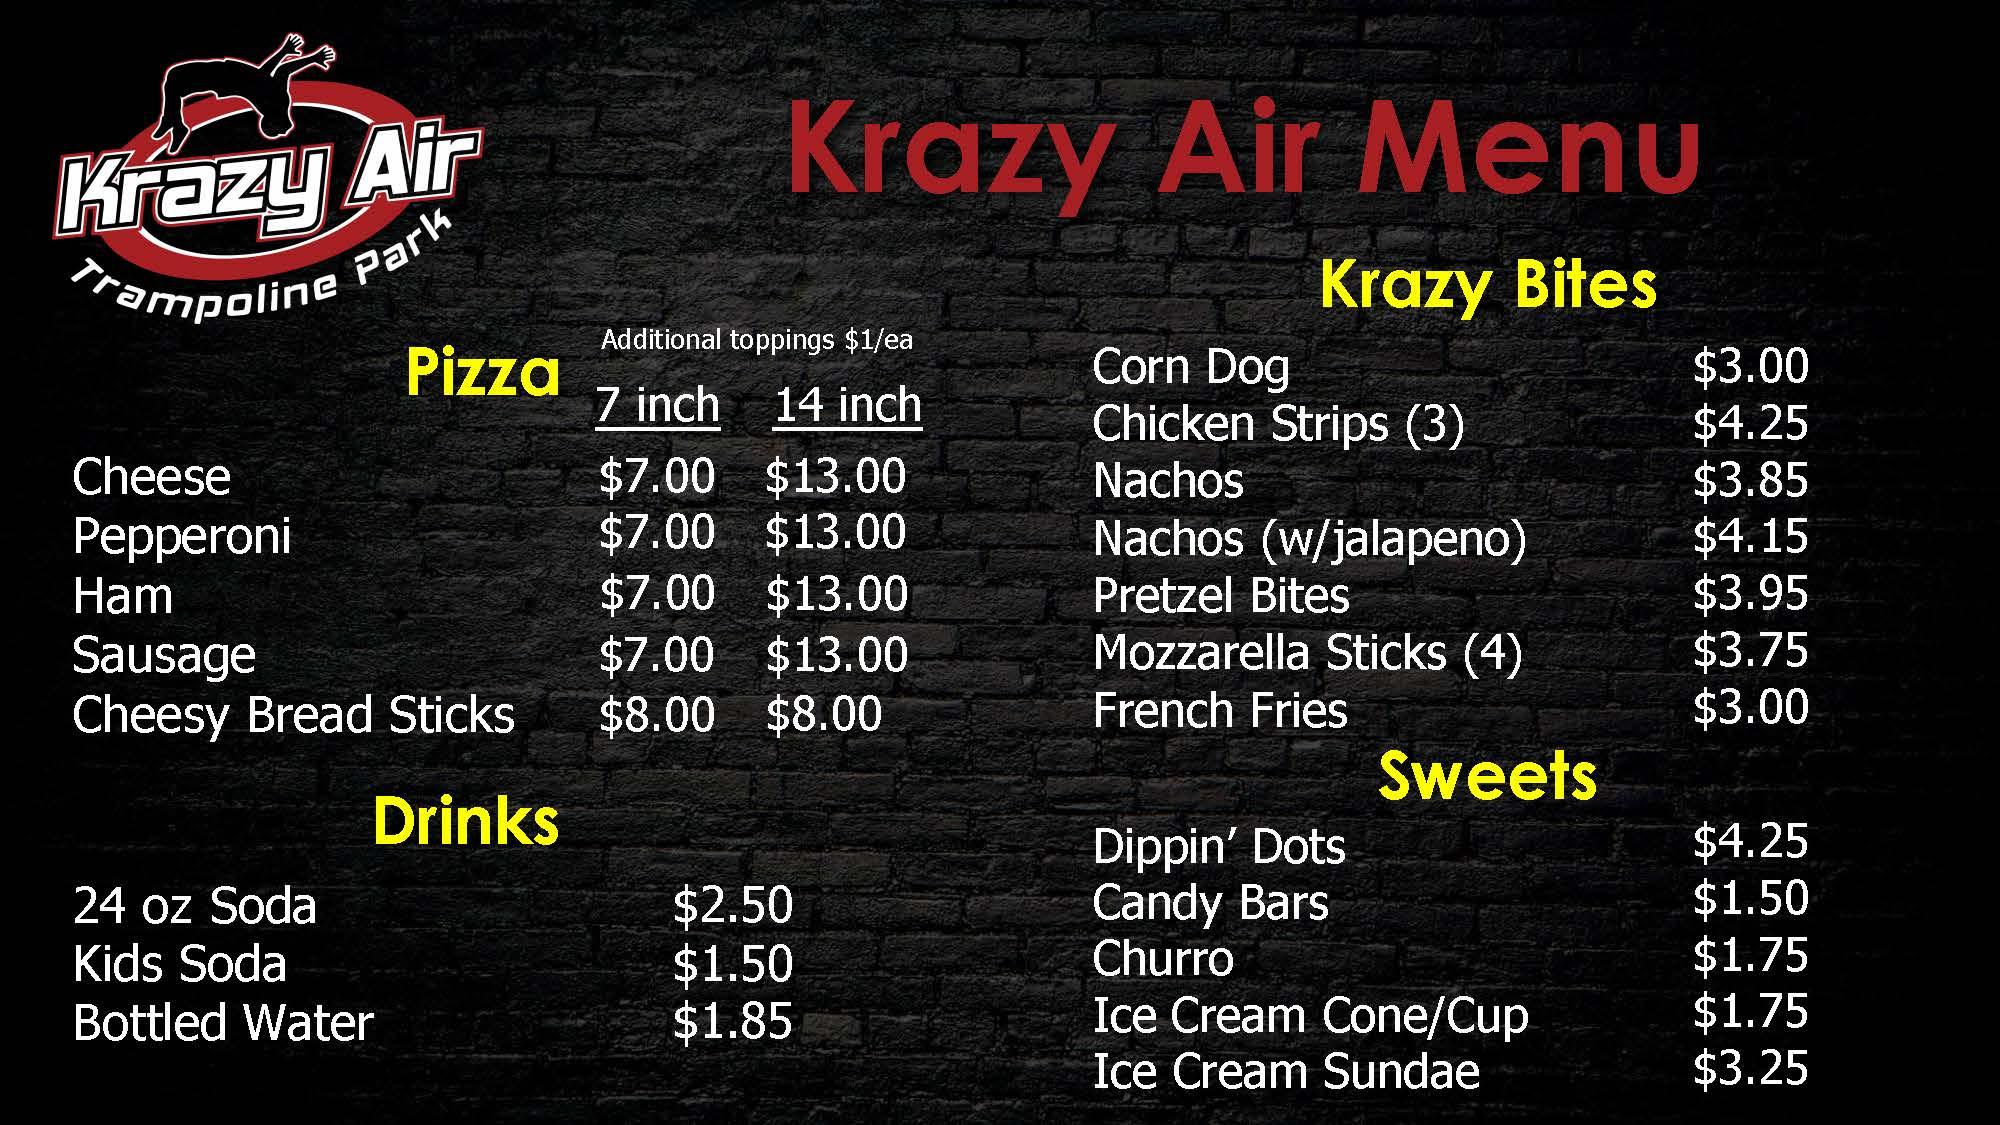 Krazy Air Pricing Menus April 2019 - 3-edit_Page_2